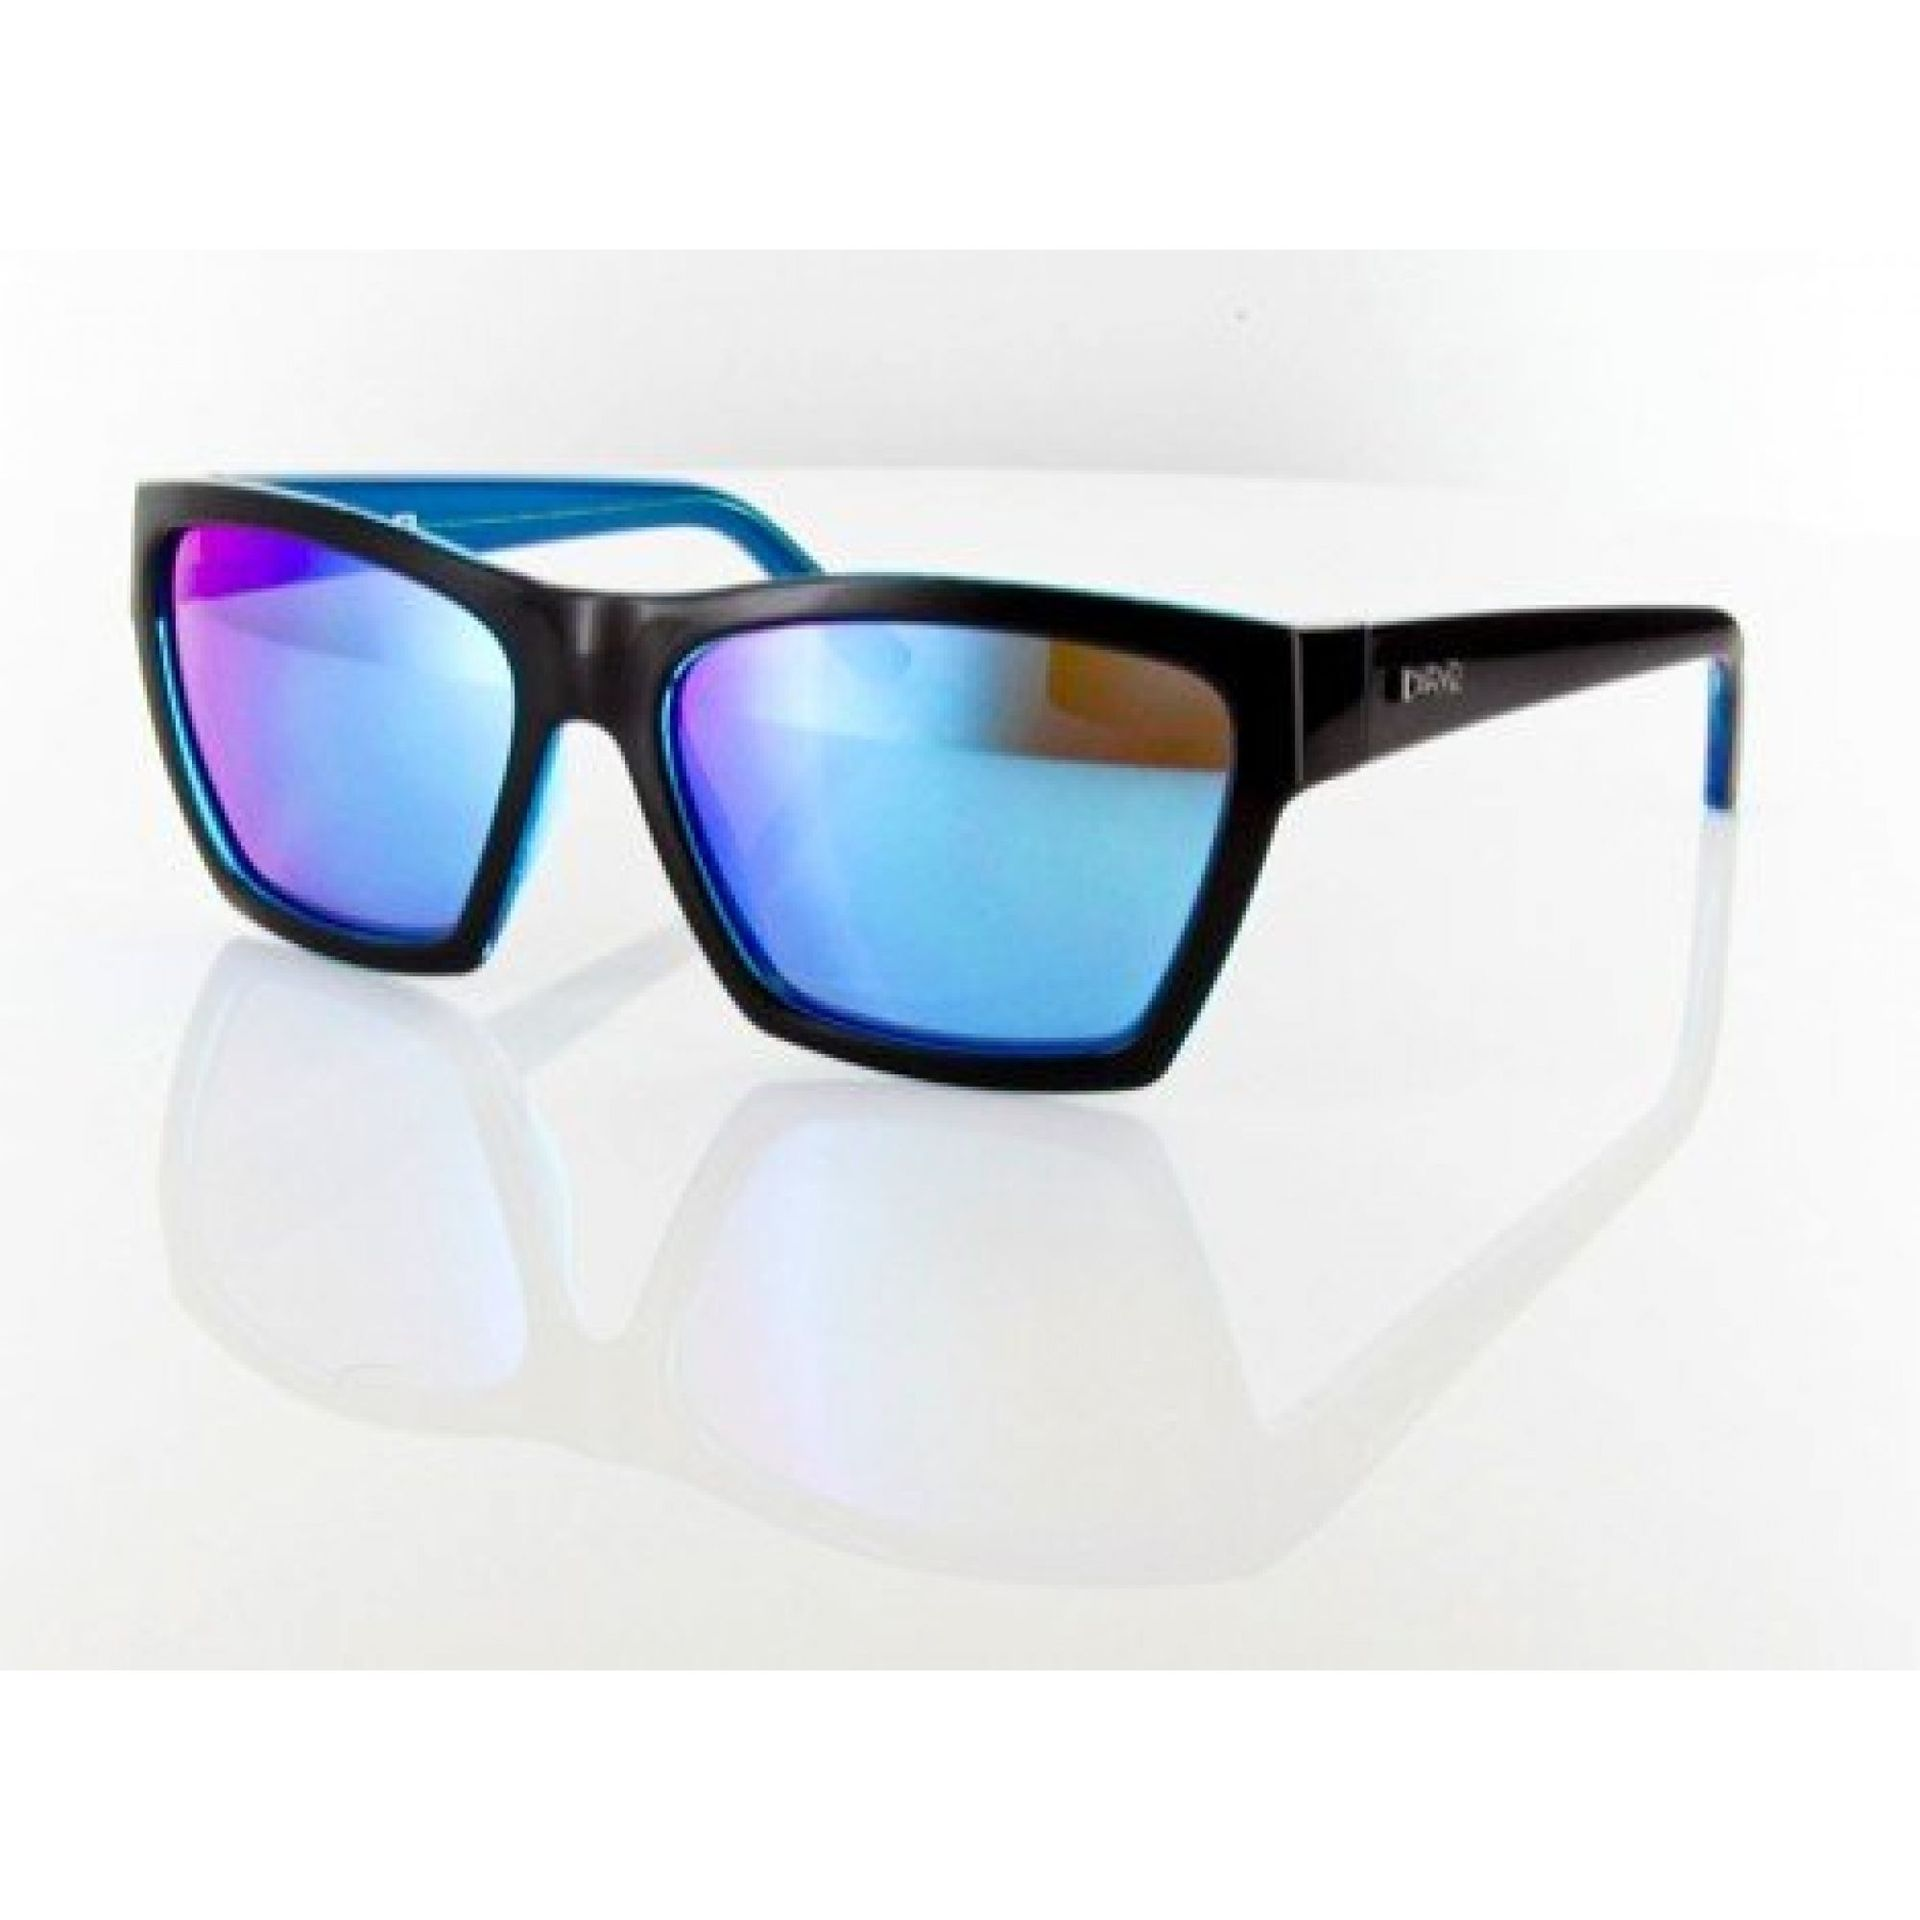 Okulary Carve Hostile czarne niebieskie